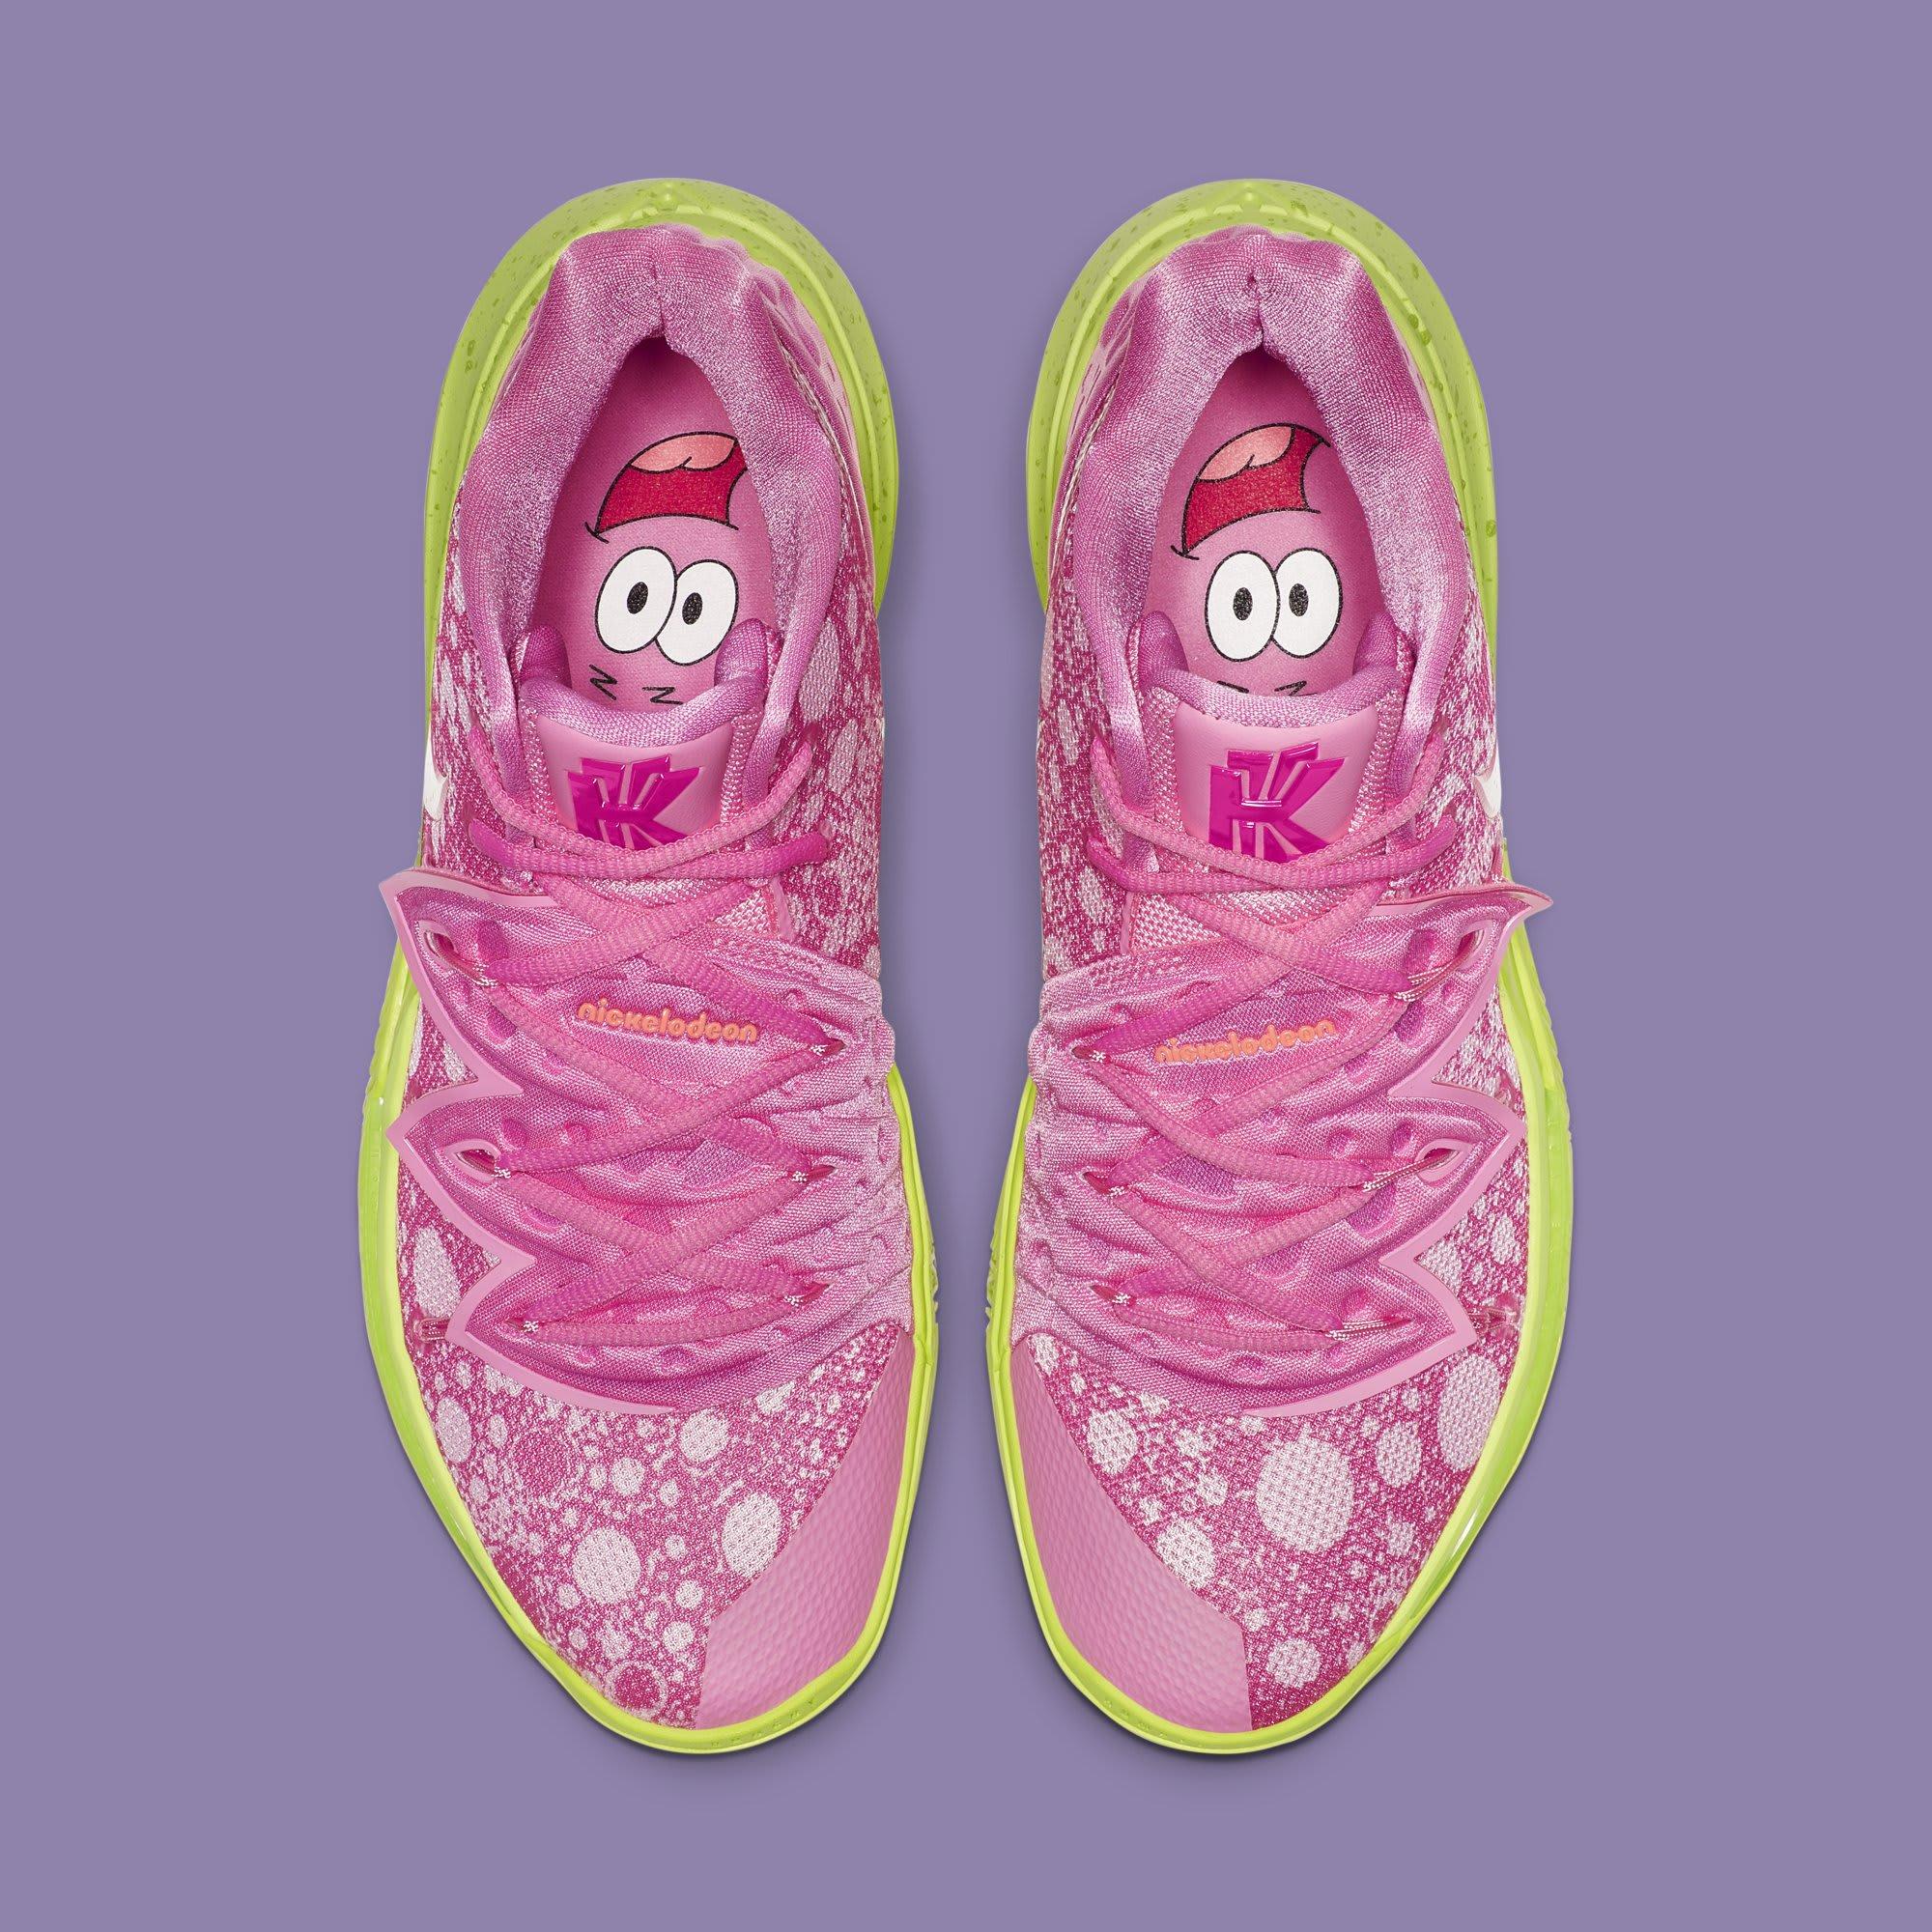 'SpongeBob SquarePants' x Nike Kyrie 5 'Patrick Star' CJ6951-600 (Top)